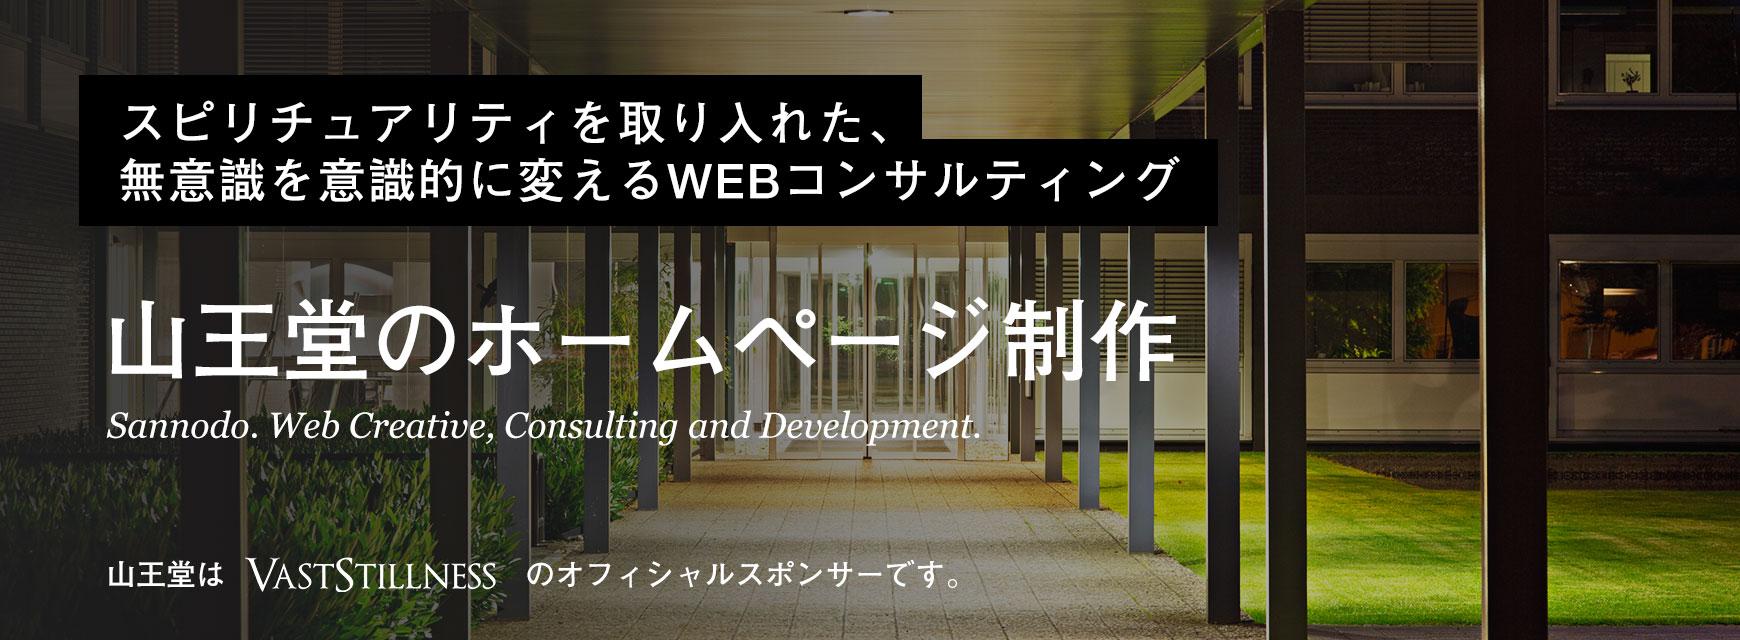 Web制作会社の山王堂